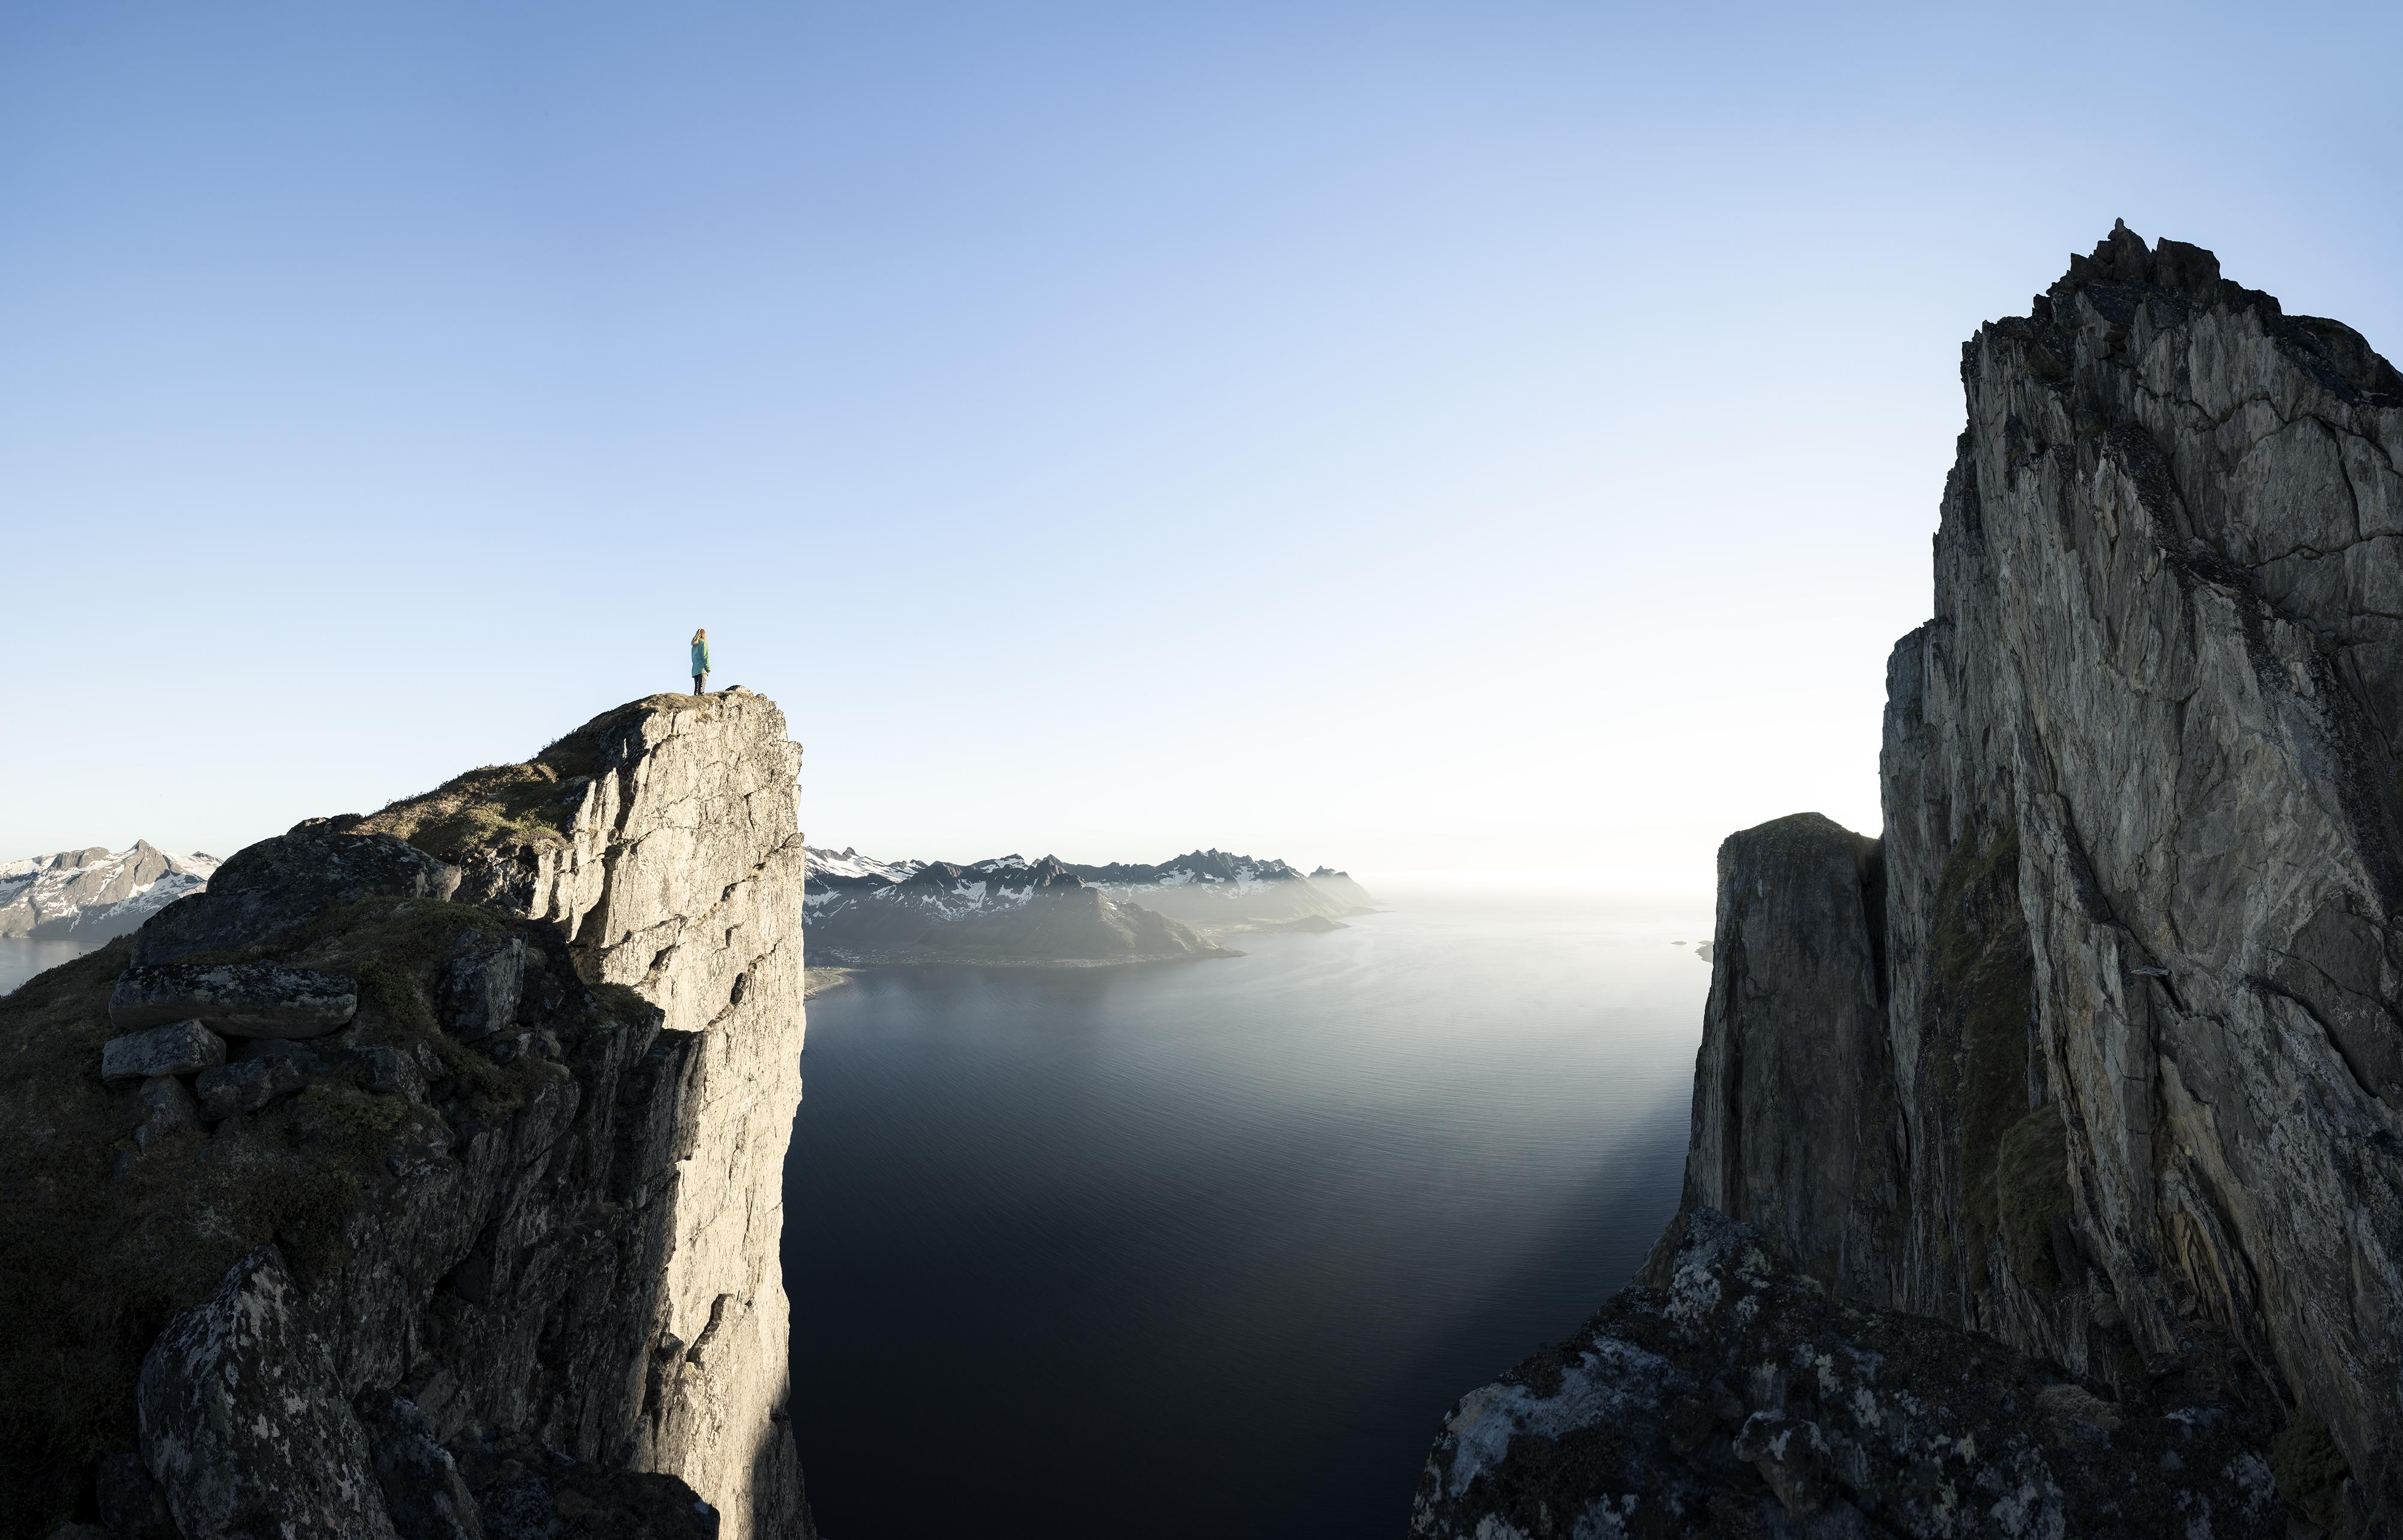 Senja, Norway